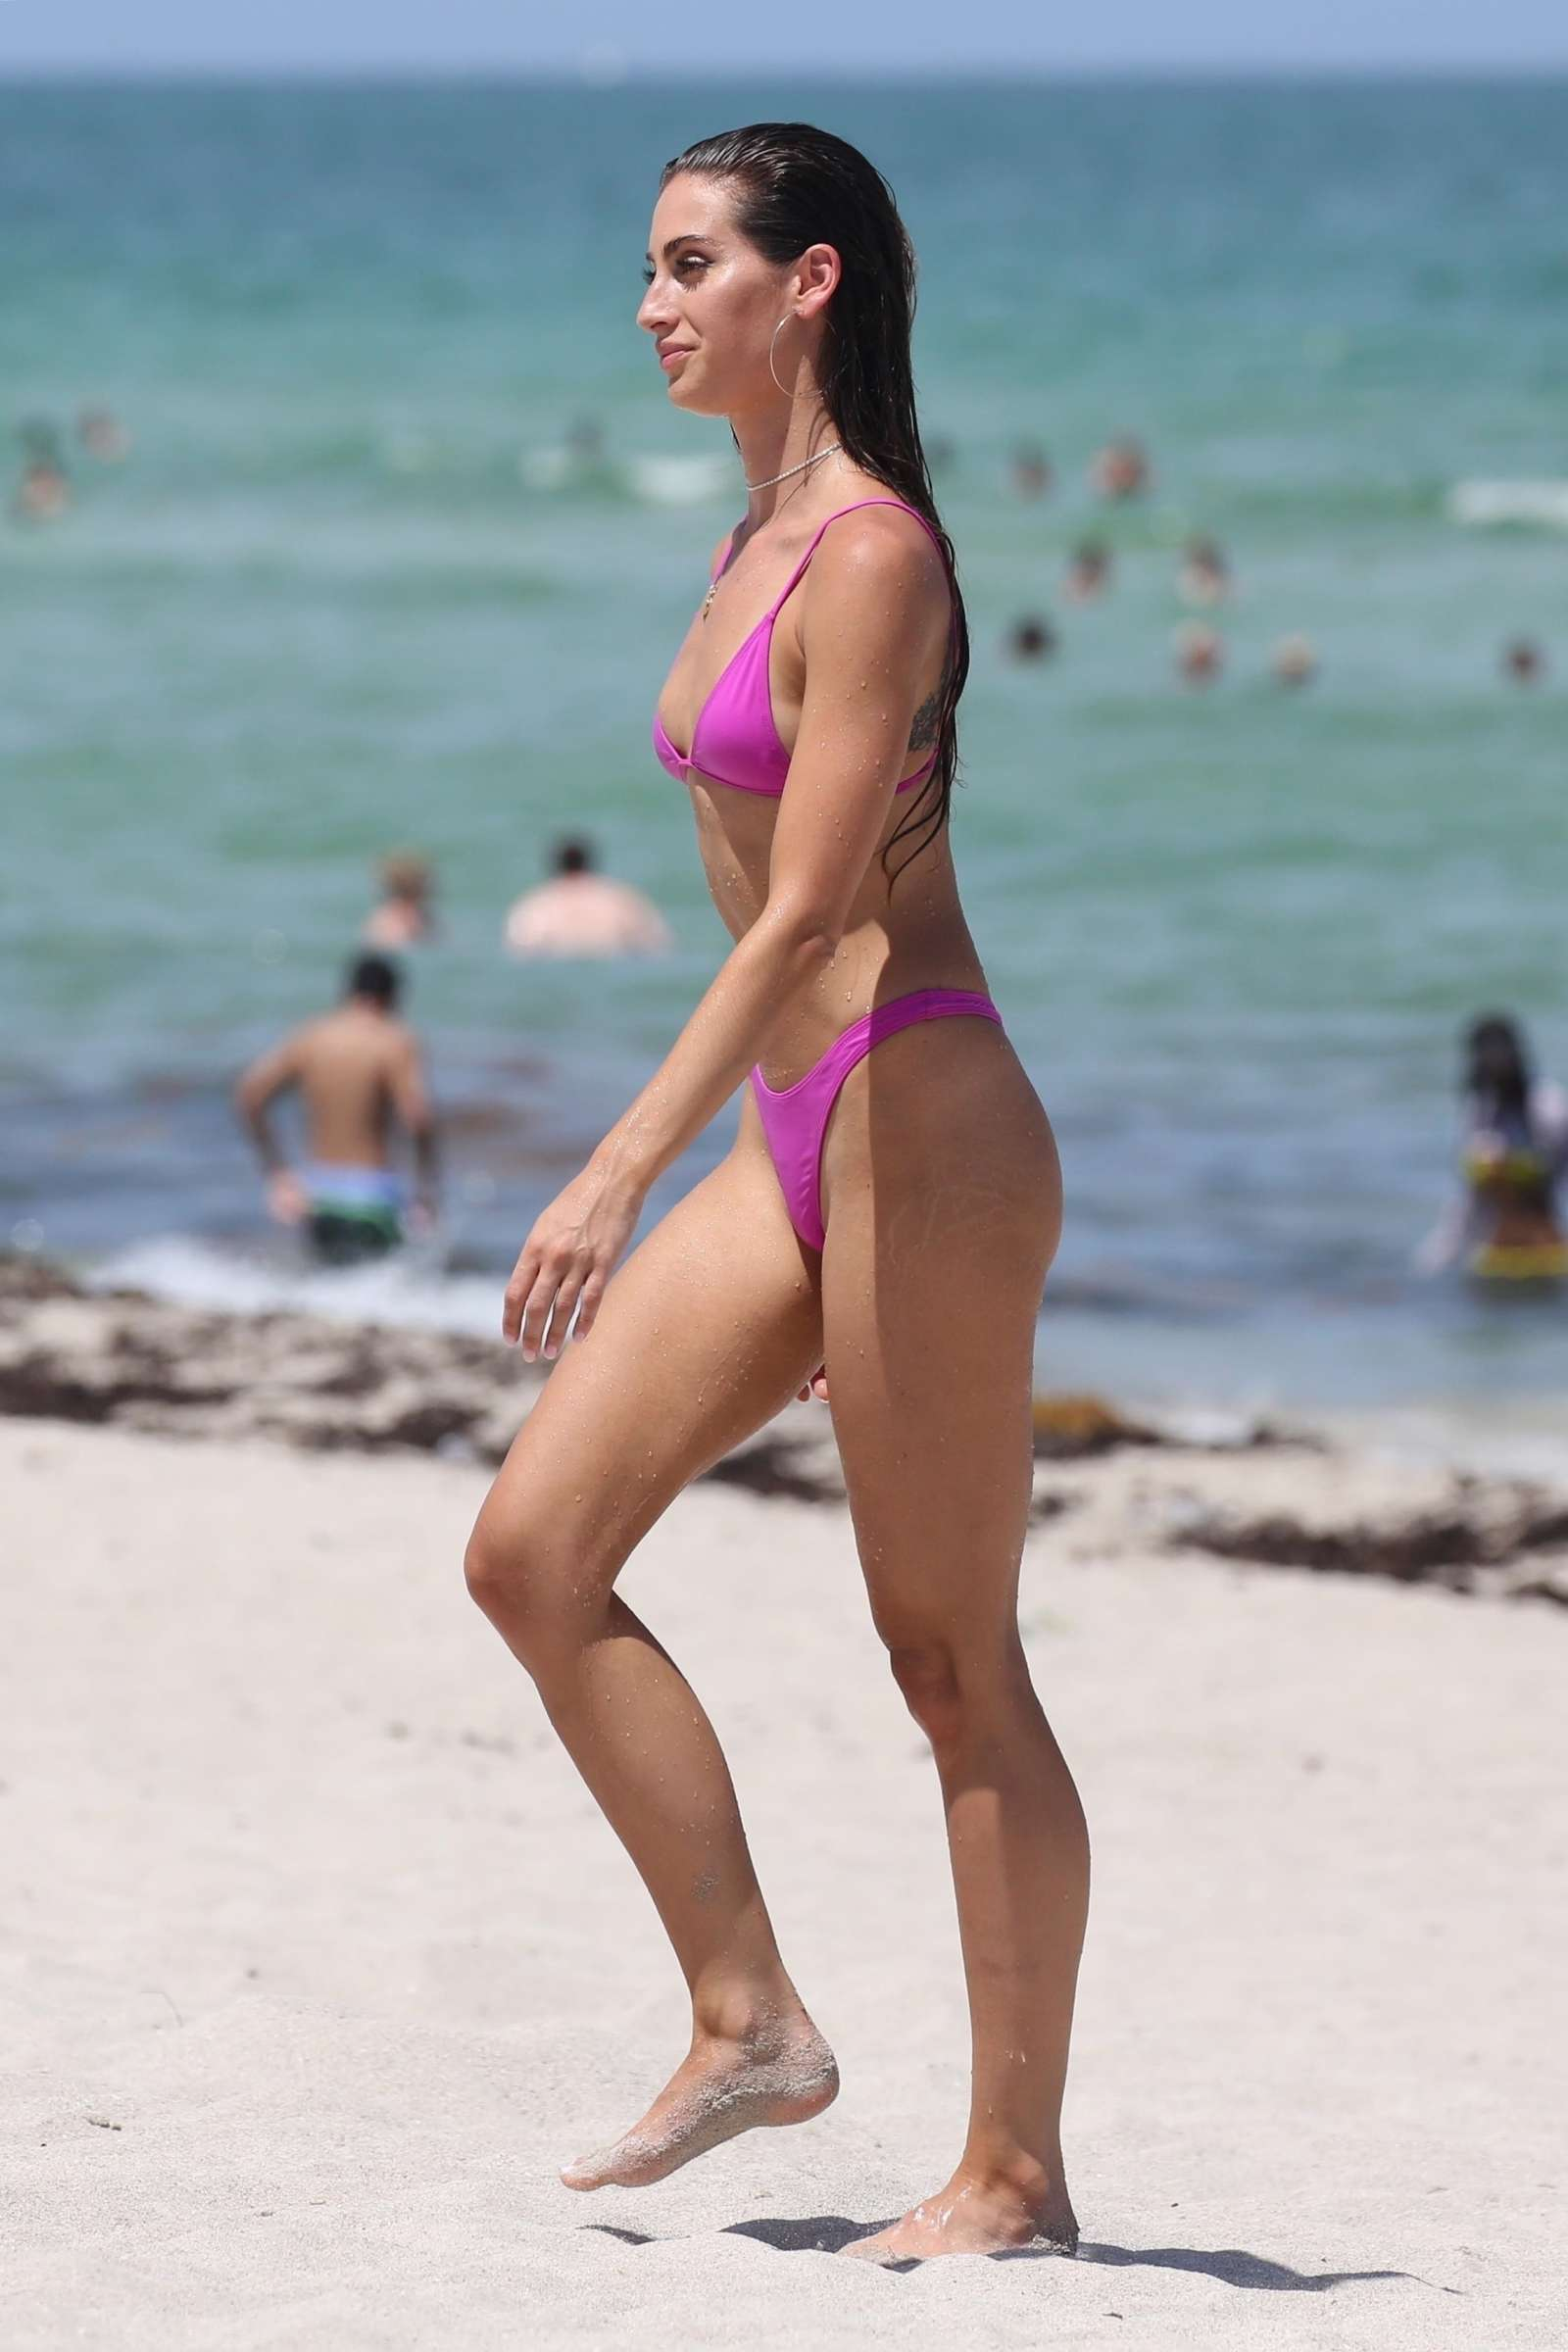 Bikini Kaylee Ricciardi naked (77 photo), Topless, Fappening, Instagram, panties 2006